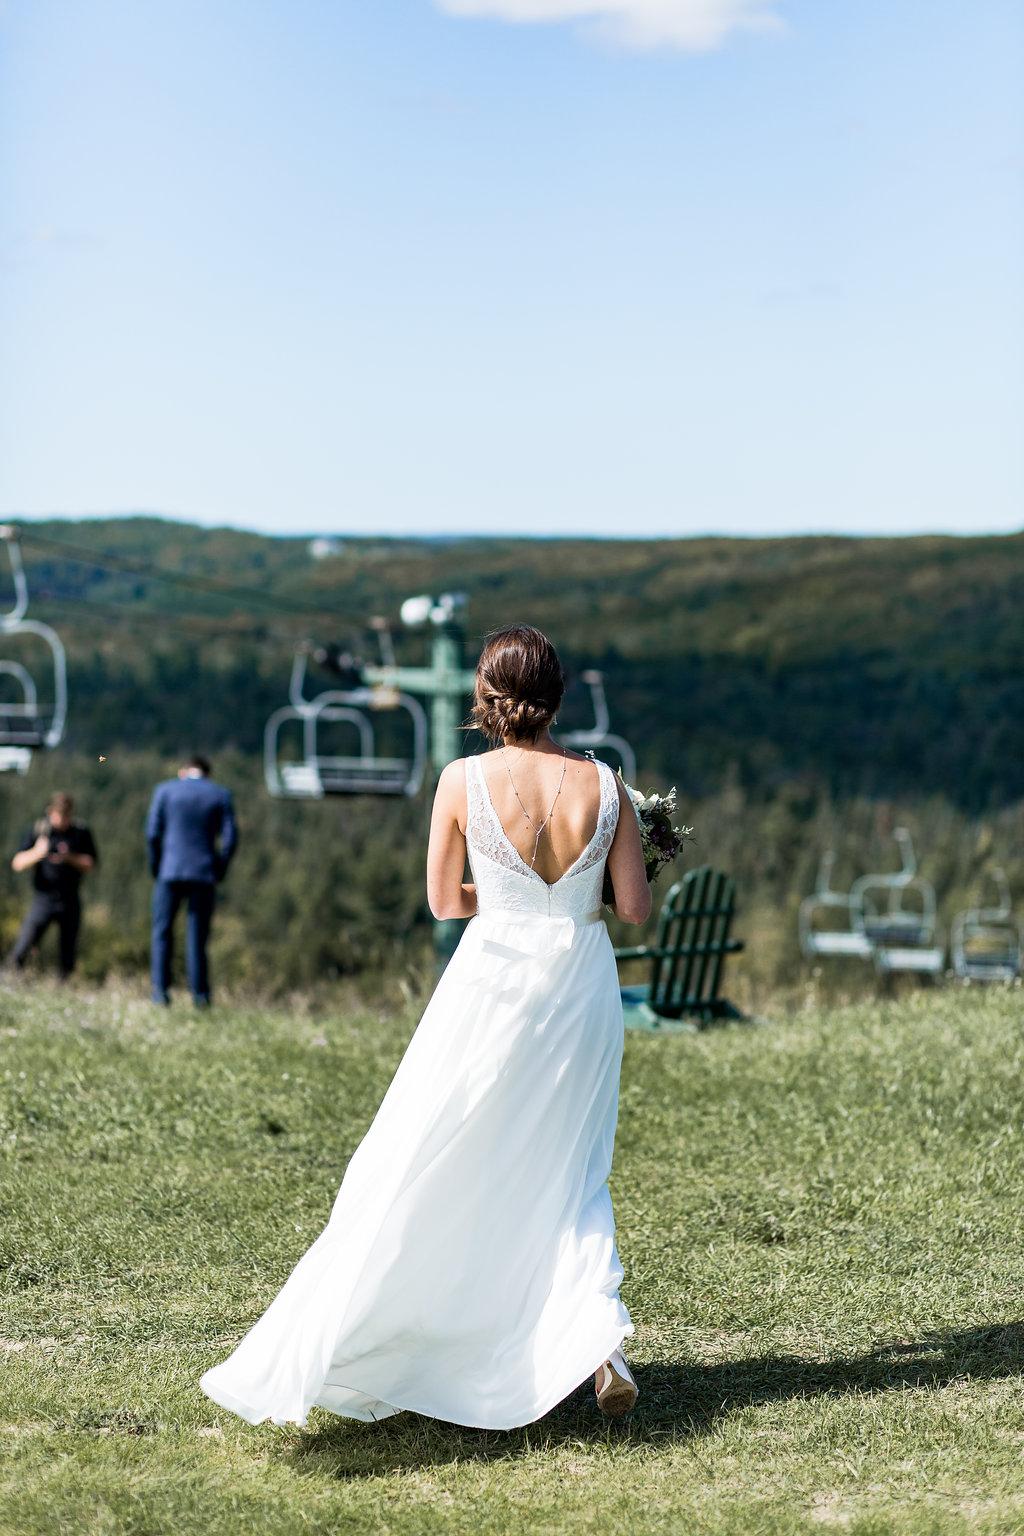 Sonshine_barn_northern_michigan_wedding_-34.jpg